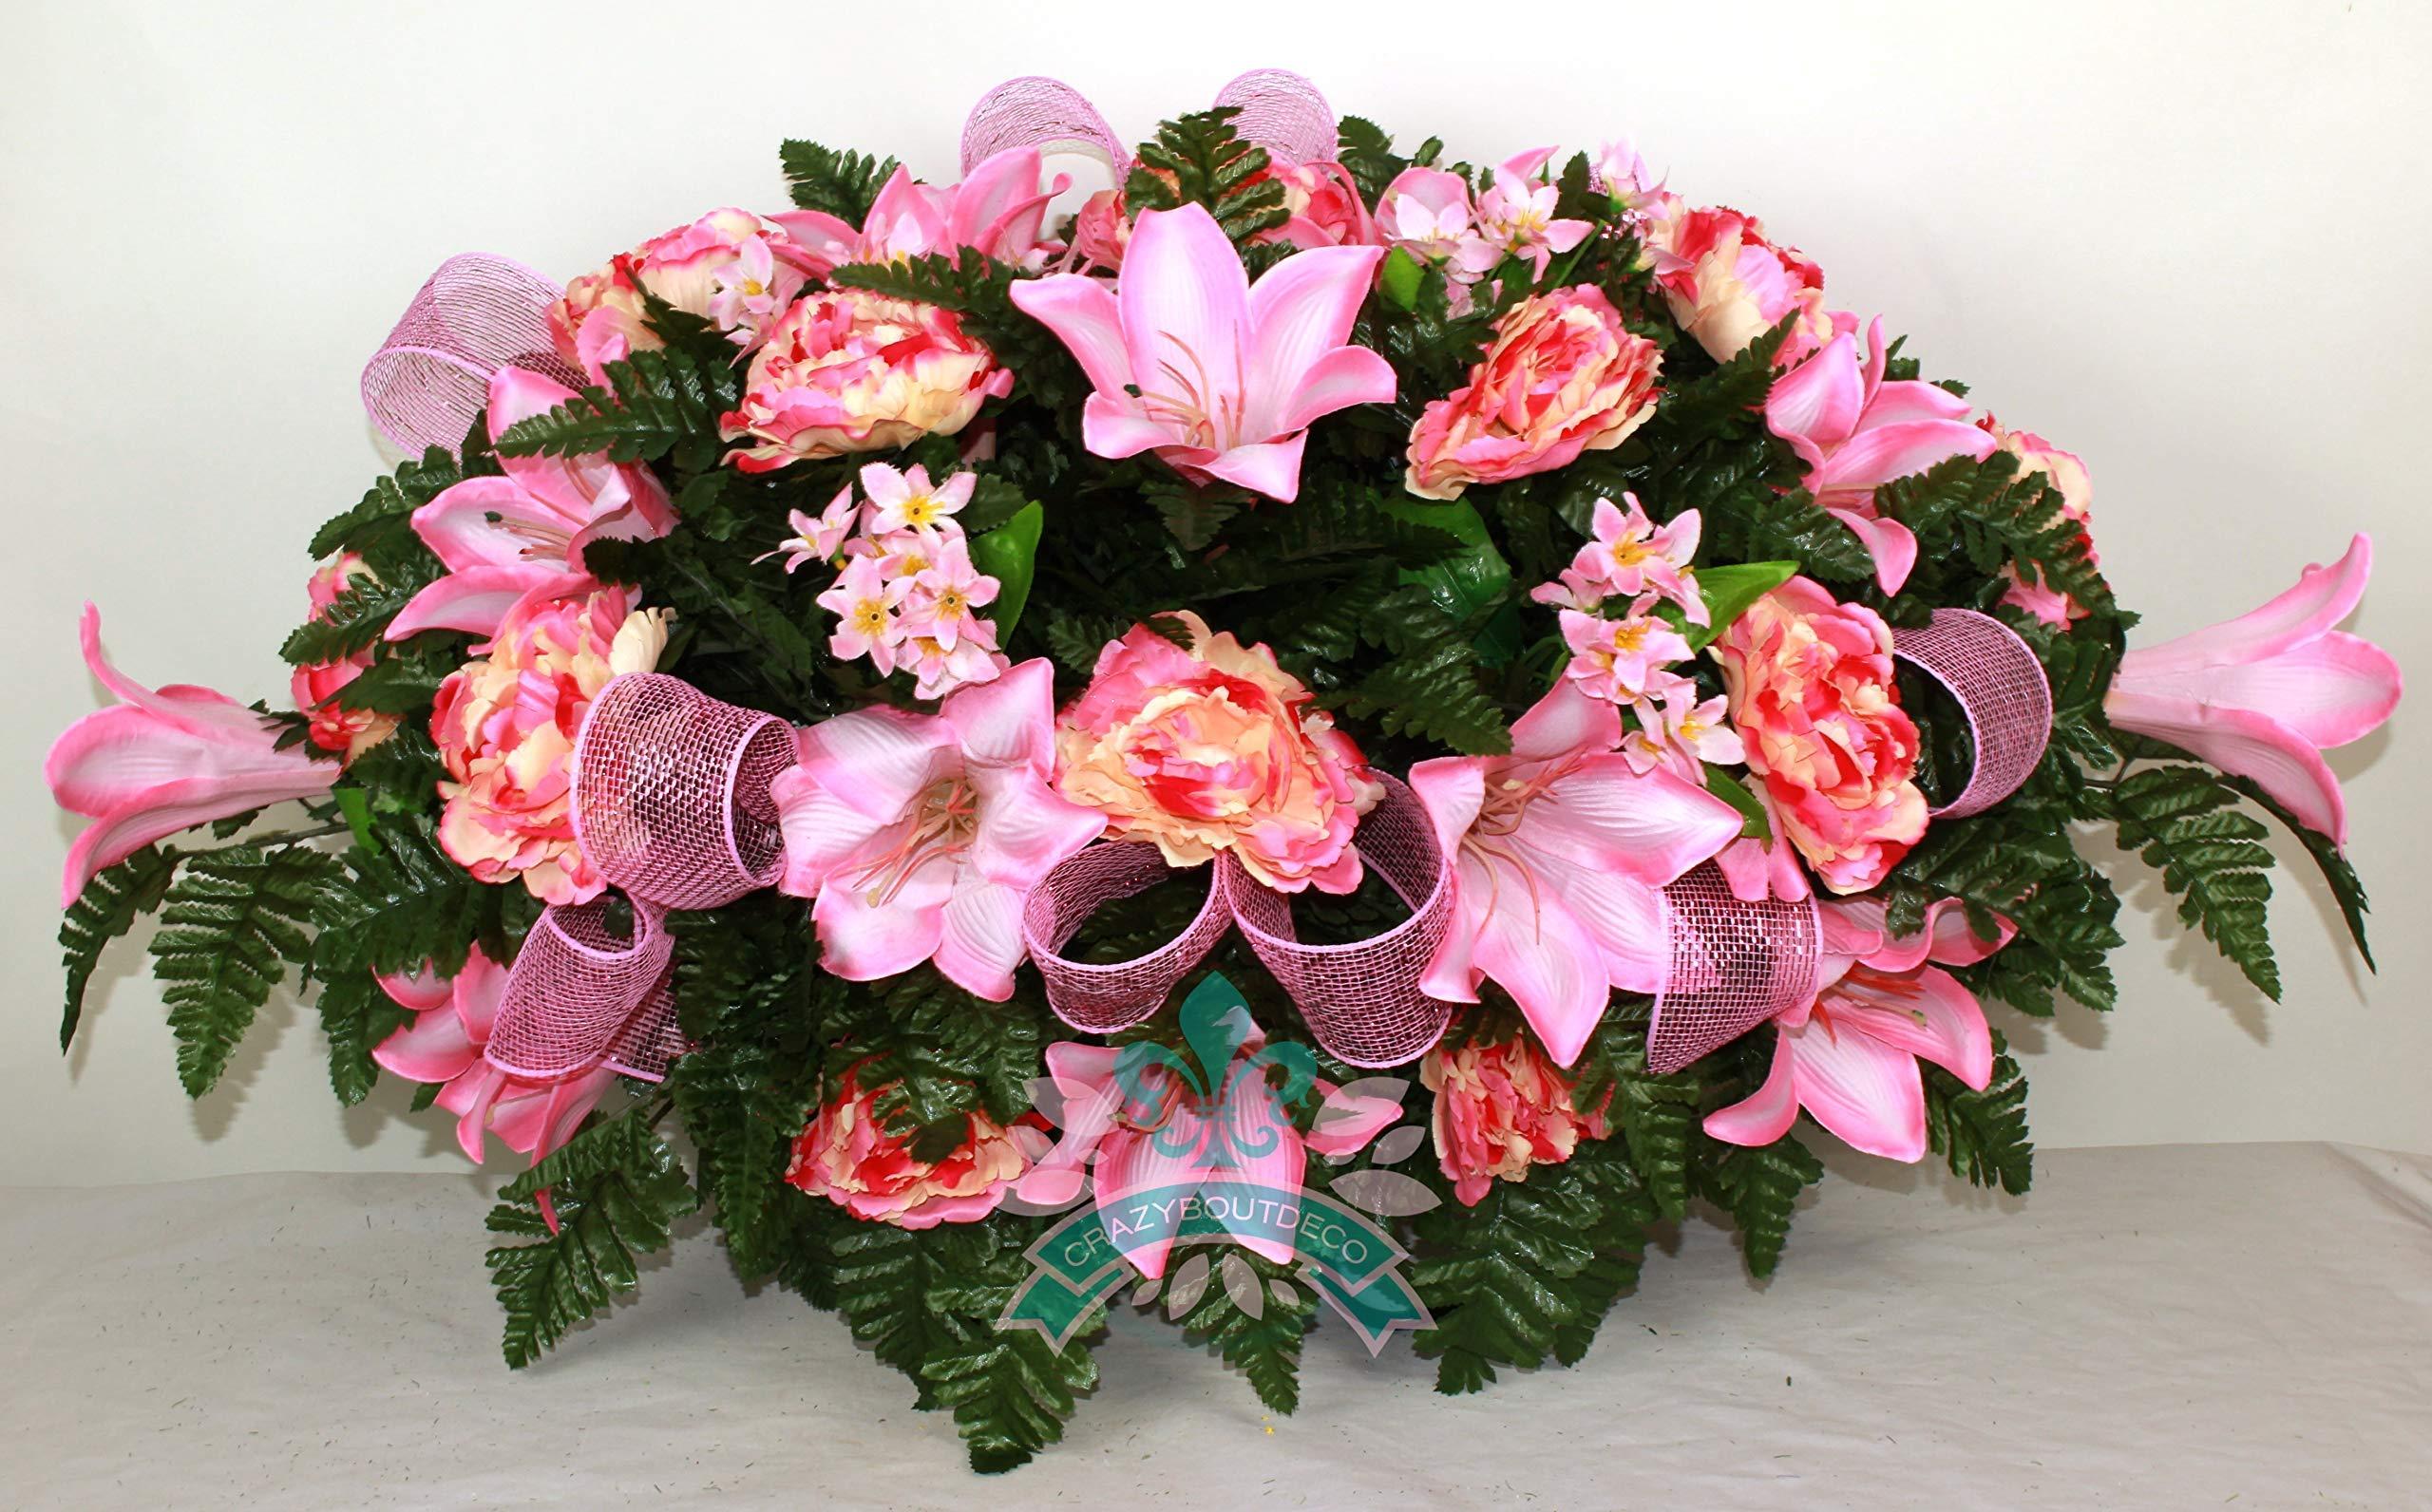 Beautiful-XL-Spring-Easter-Lilies-Cemetery-Saddle-Flower-Arrangement-